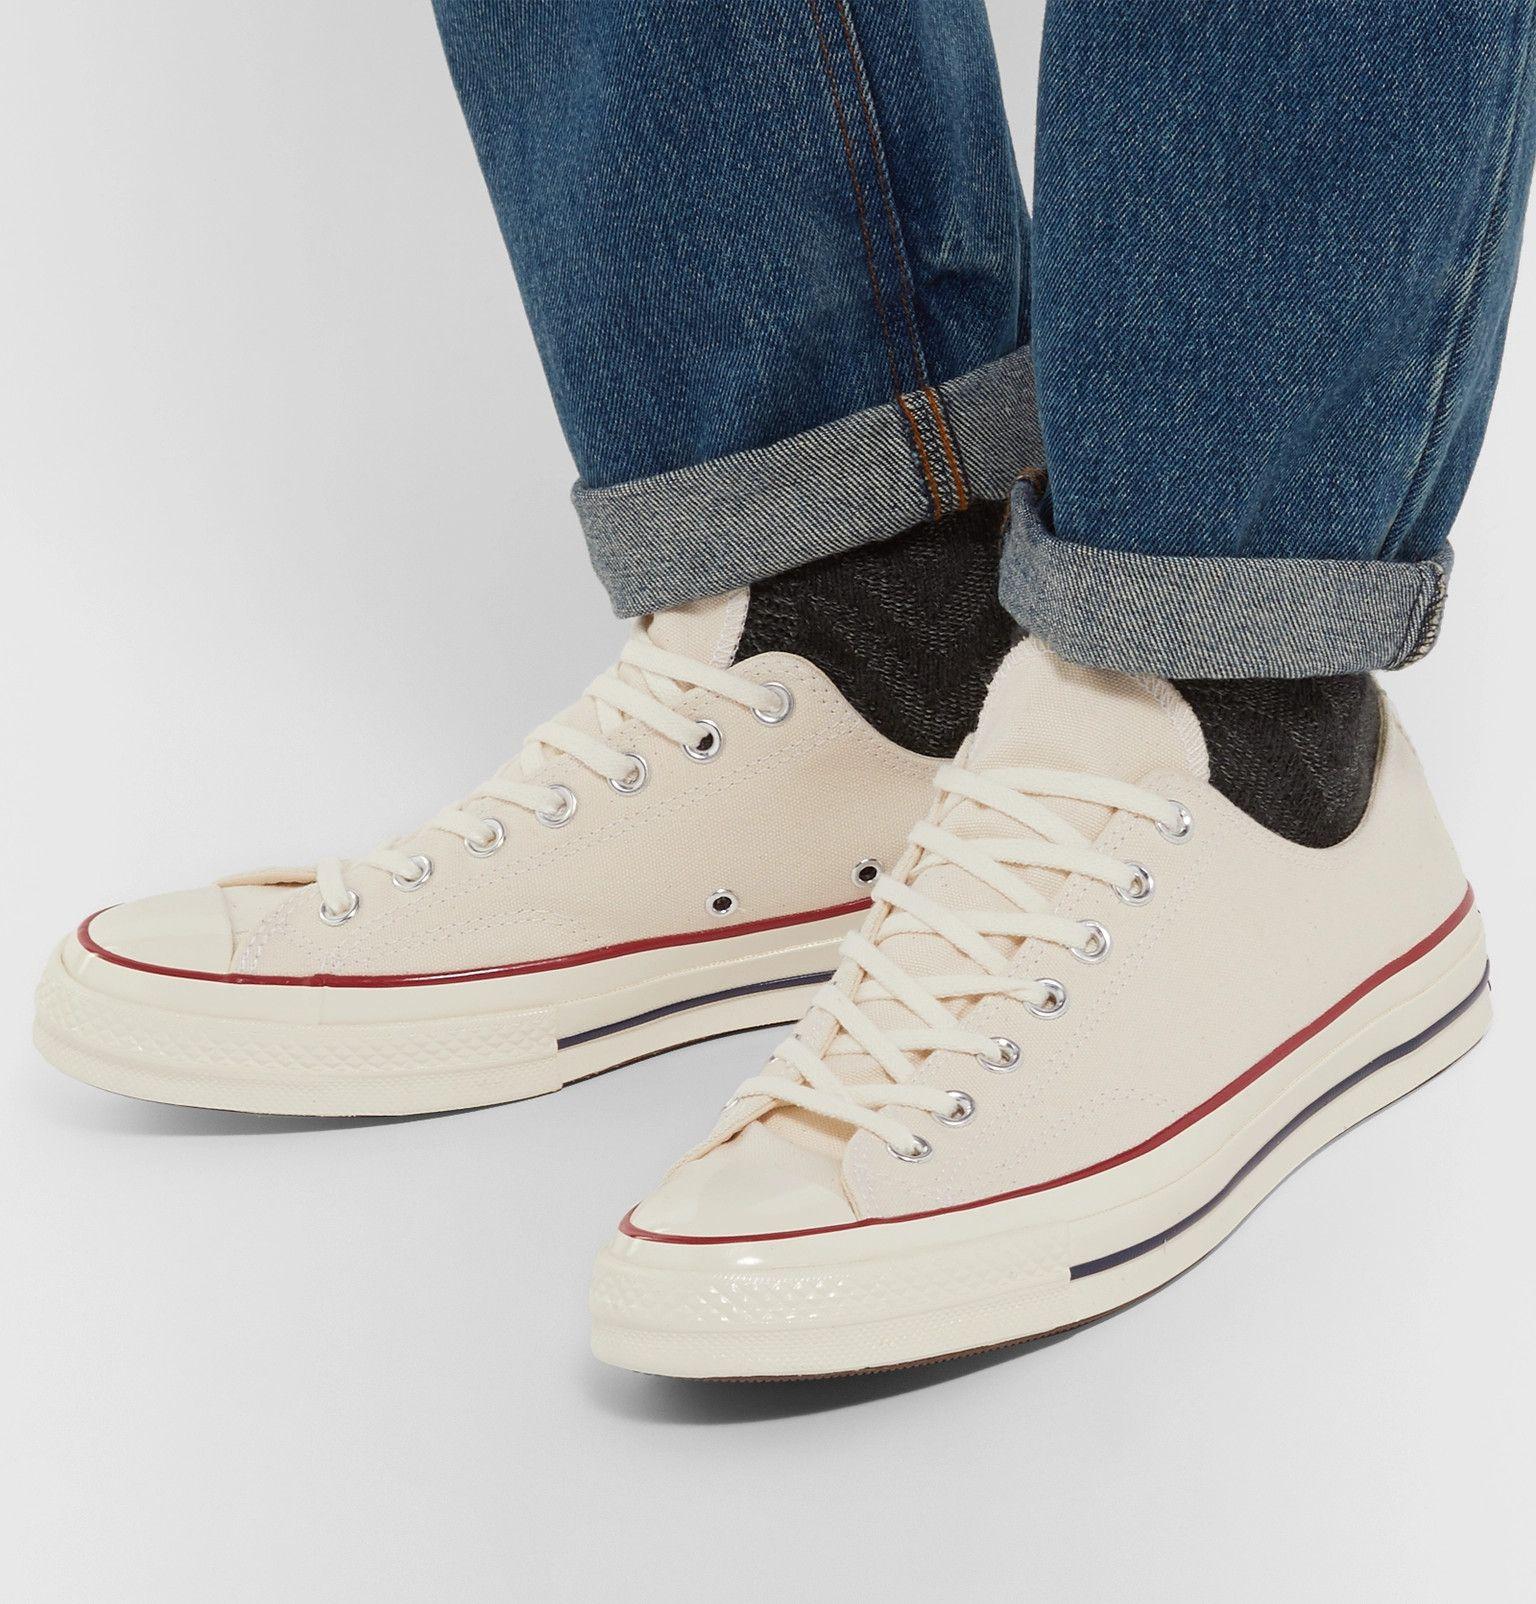 CONVERSE CHUCK 70 CANVAS SNEAKERS. #converse #shoes